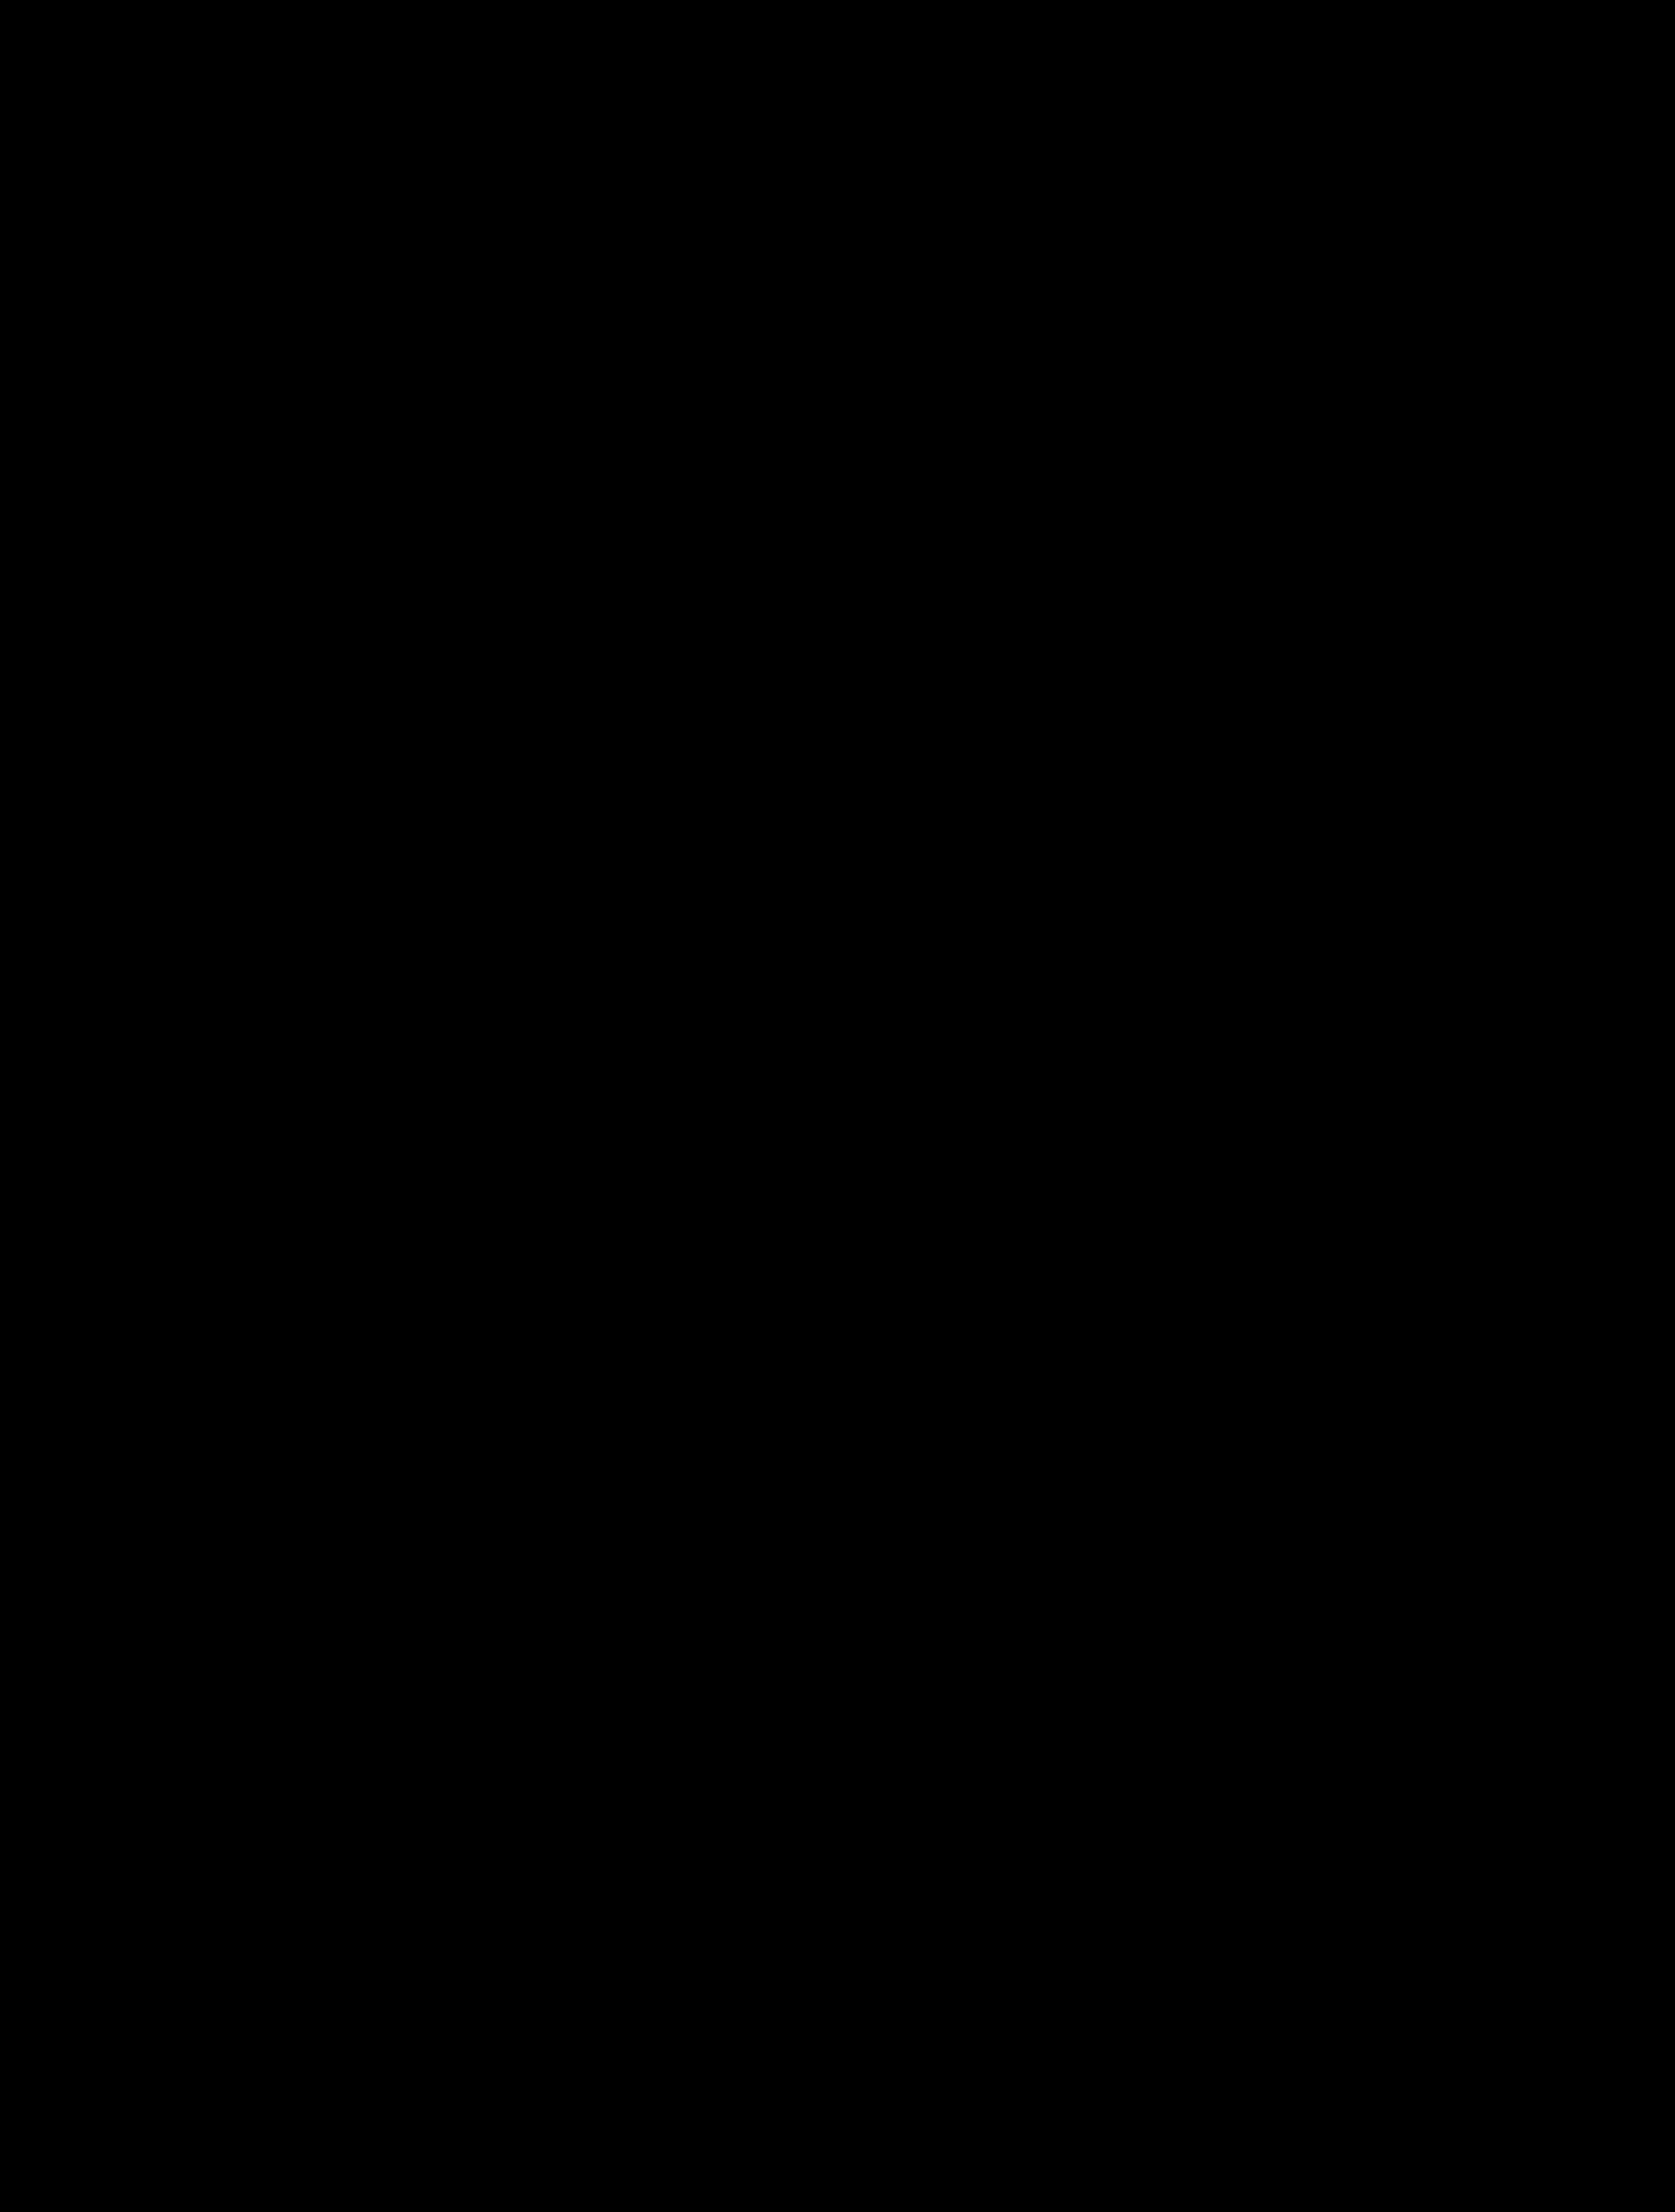 Marijuana clipart draw. Cannabis silhouette big image